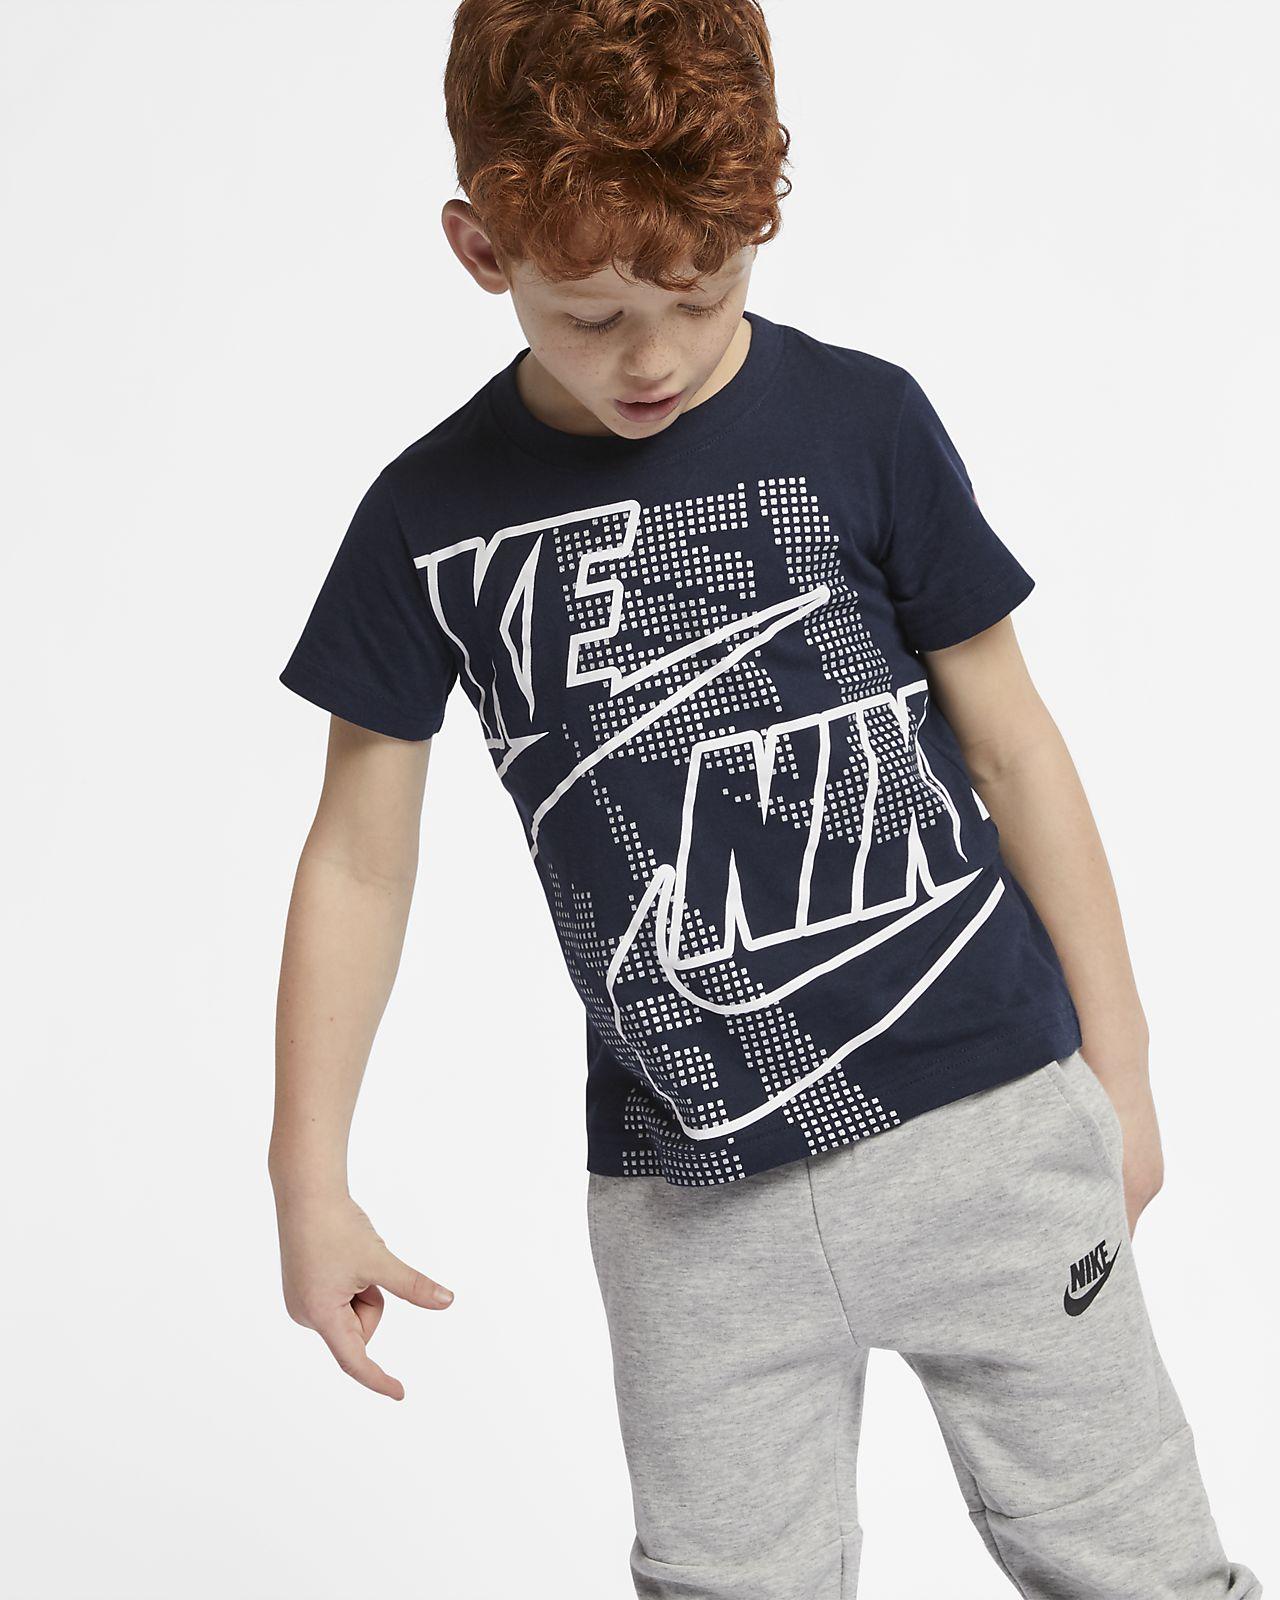 T-shirt Nike Sportswear för små barn